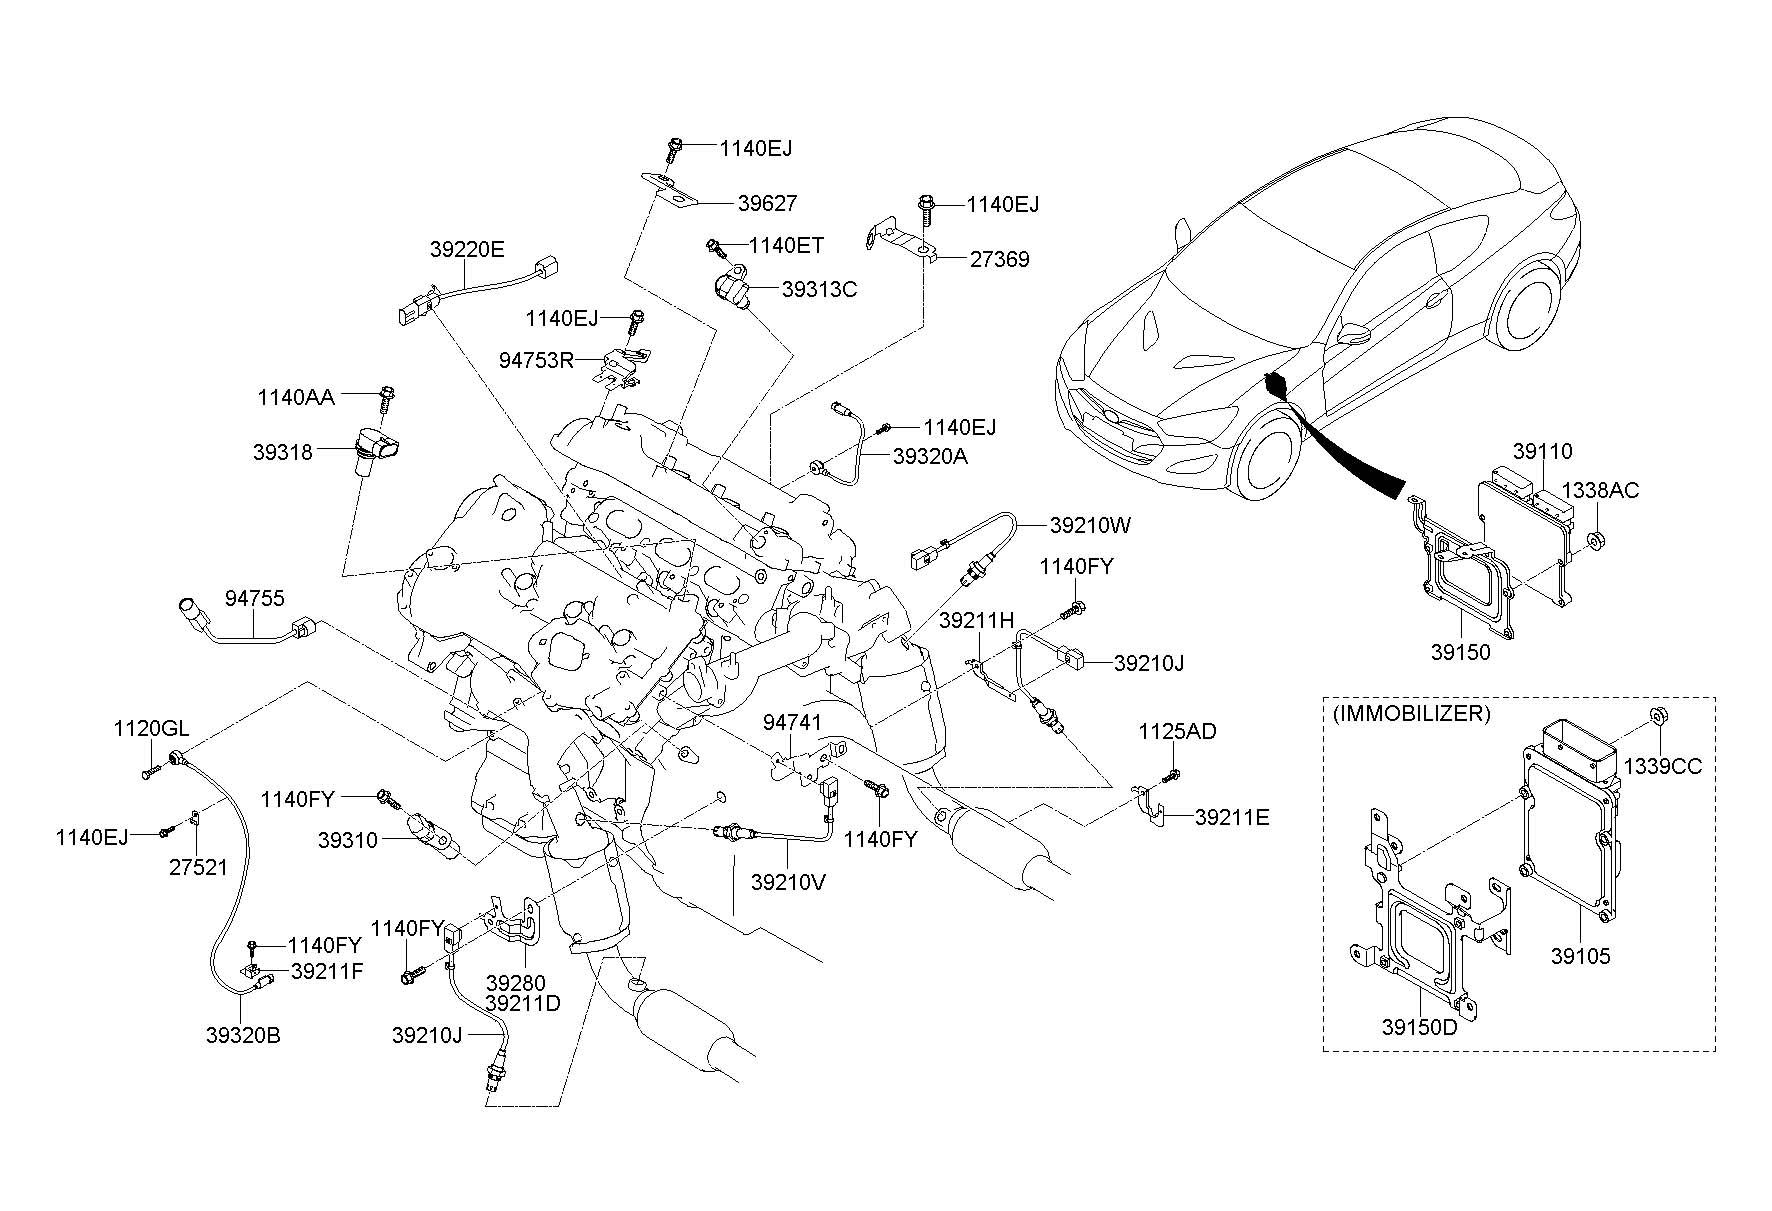 Hyundai Veracruz Wiring Diagram Hyundai Wiring Diagram